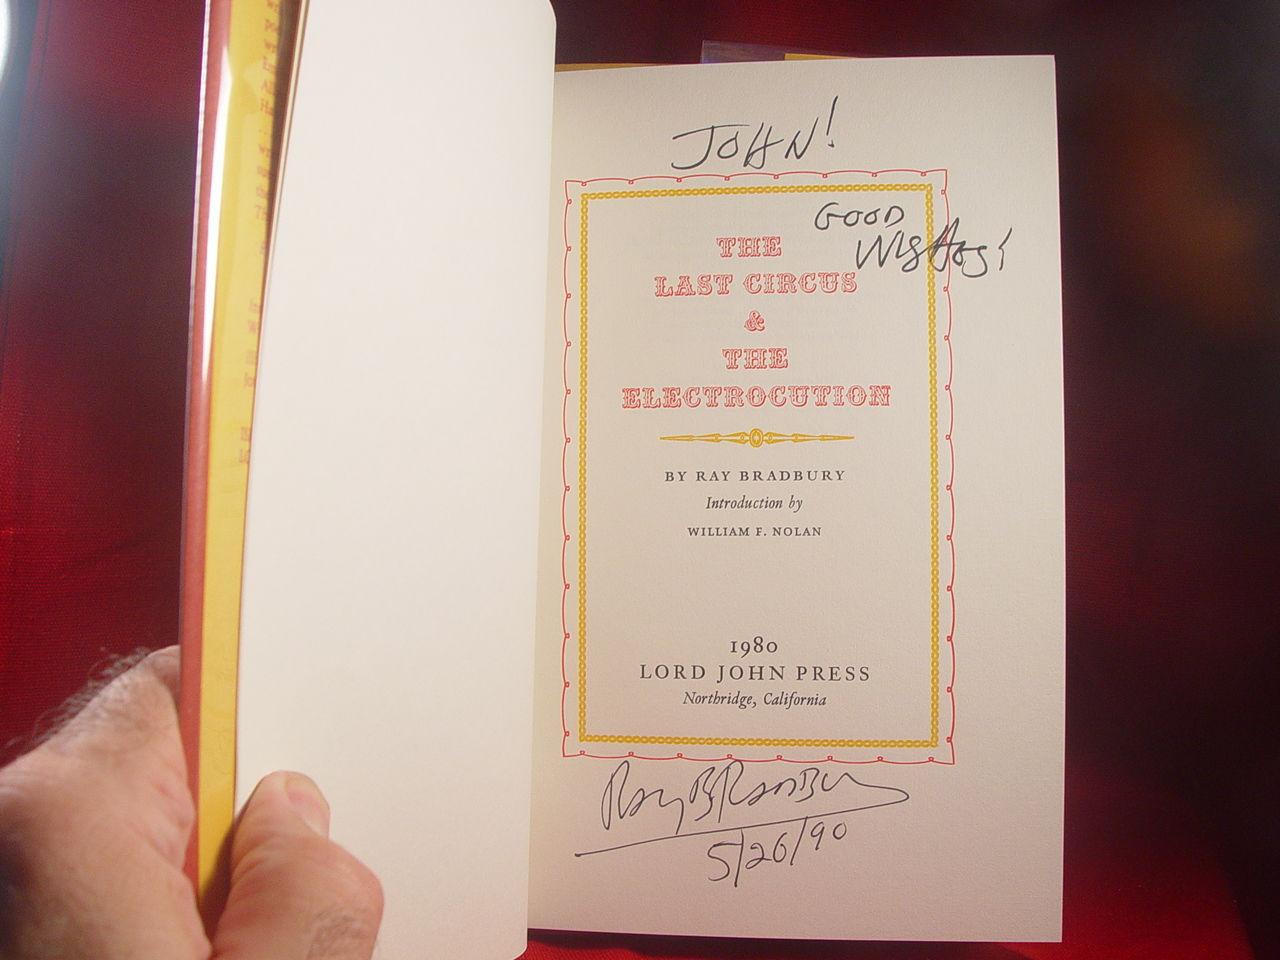 Ray Bradbury THE LAST CIRCUS & THE ELECTROCUTION - 1st trade edition /jacket